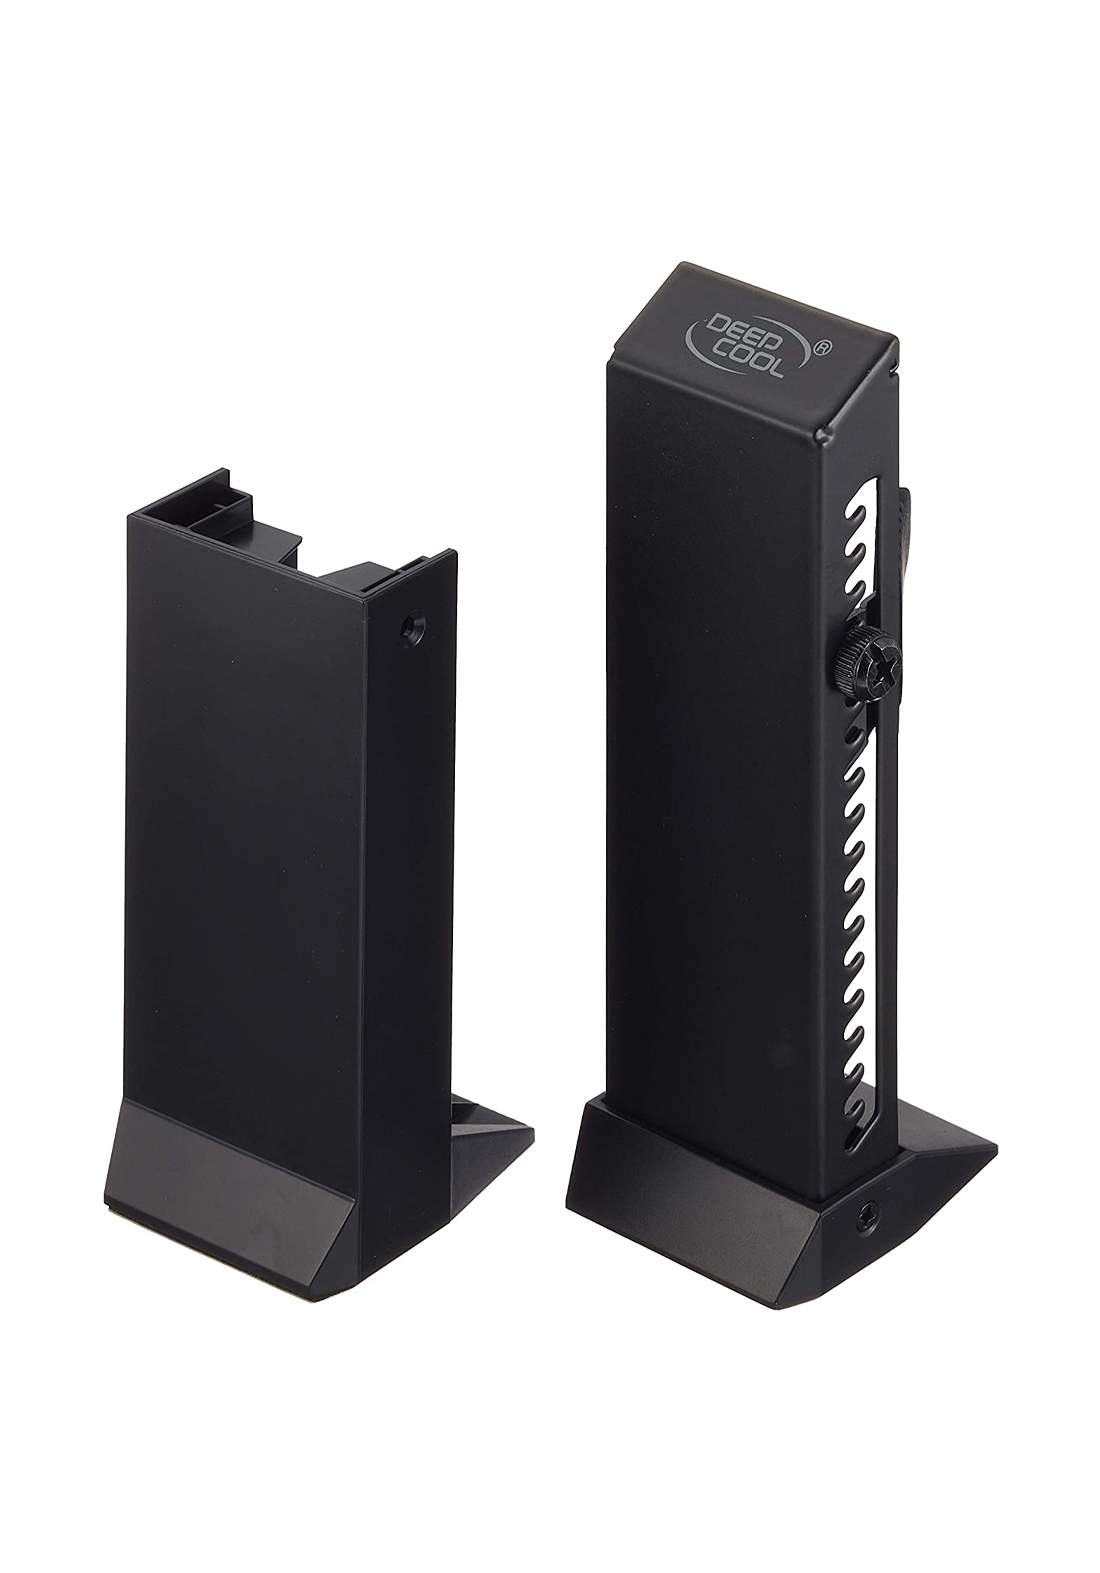 DeepCool GH-01  Graphics Card Holder - Black حامل كارد شاشة